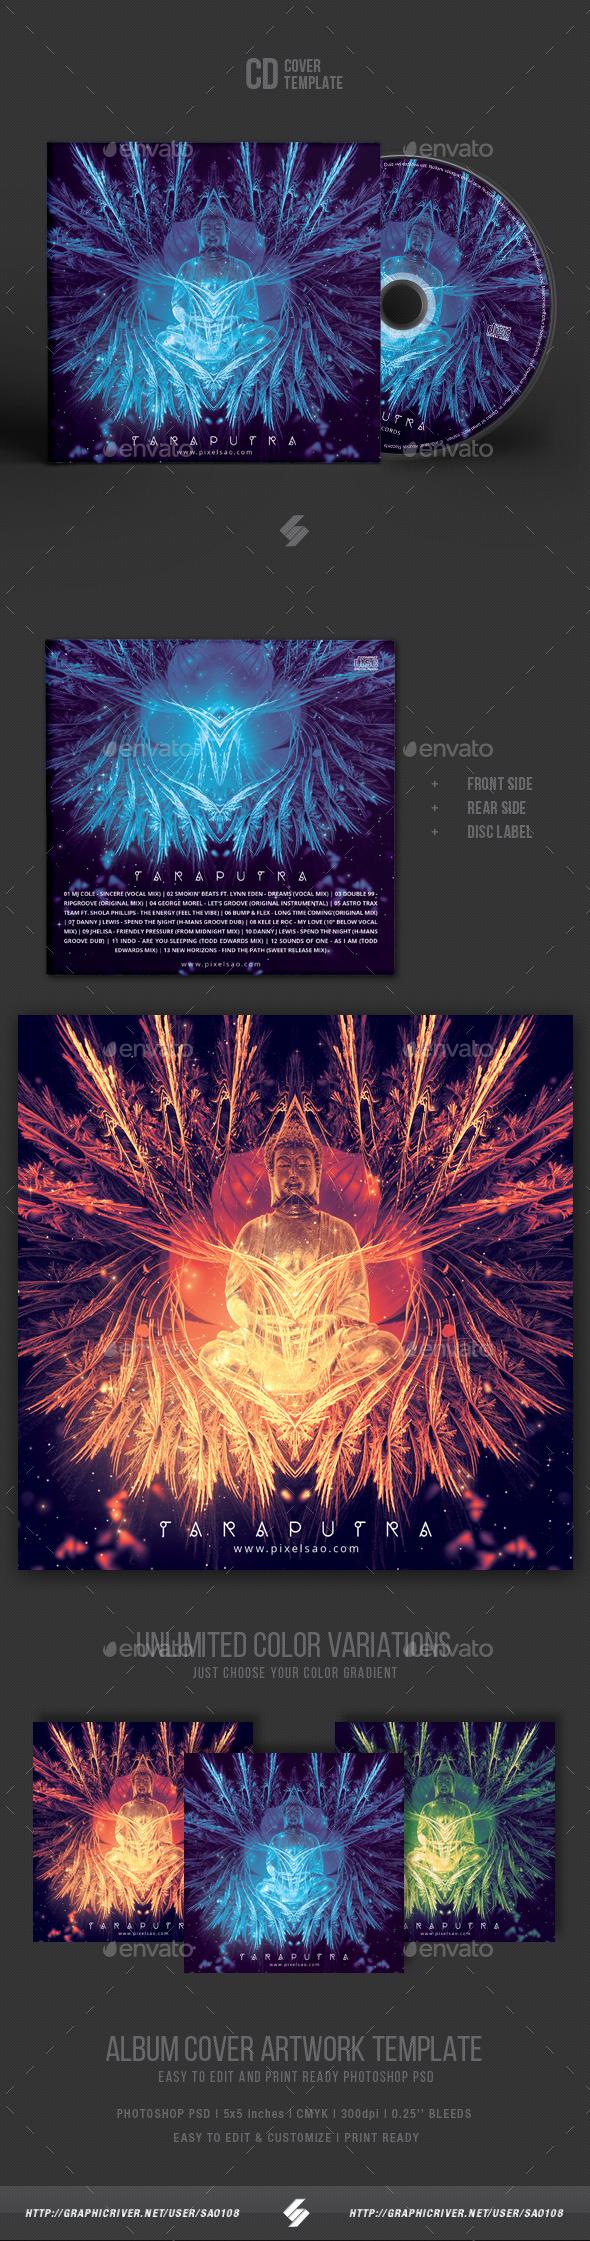 Taraputra - CD Cover Artwork Template - CD & DVD Artwork Print Templates